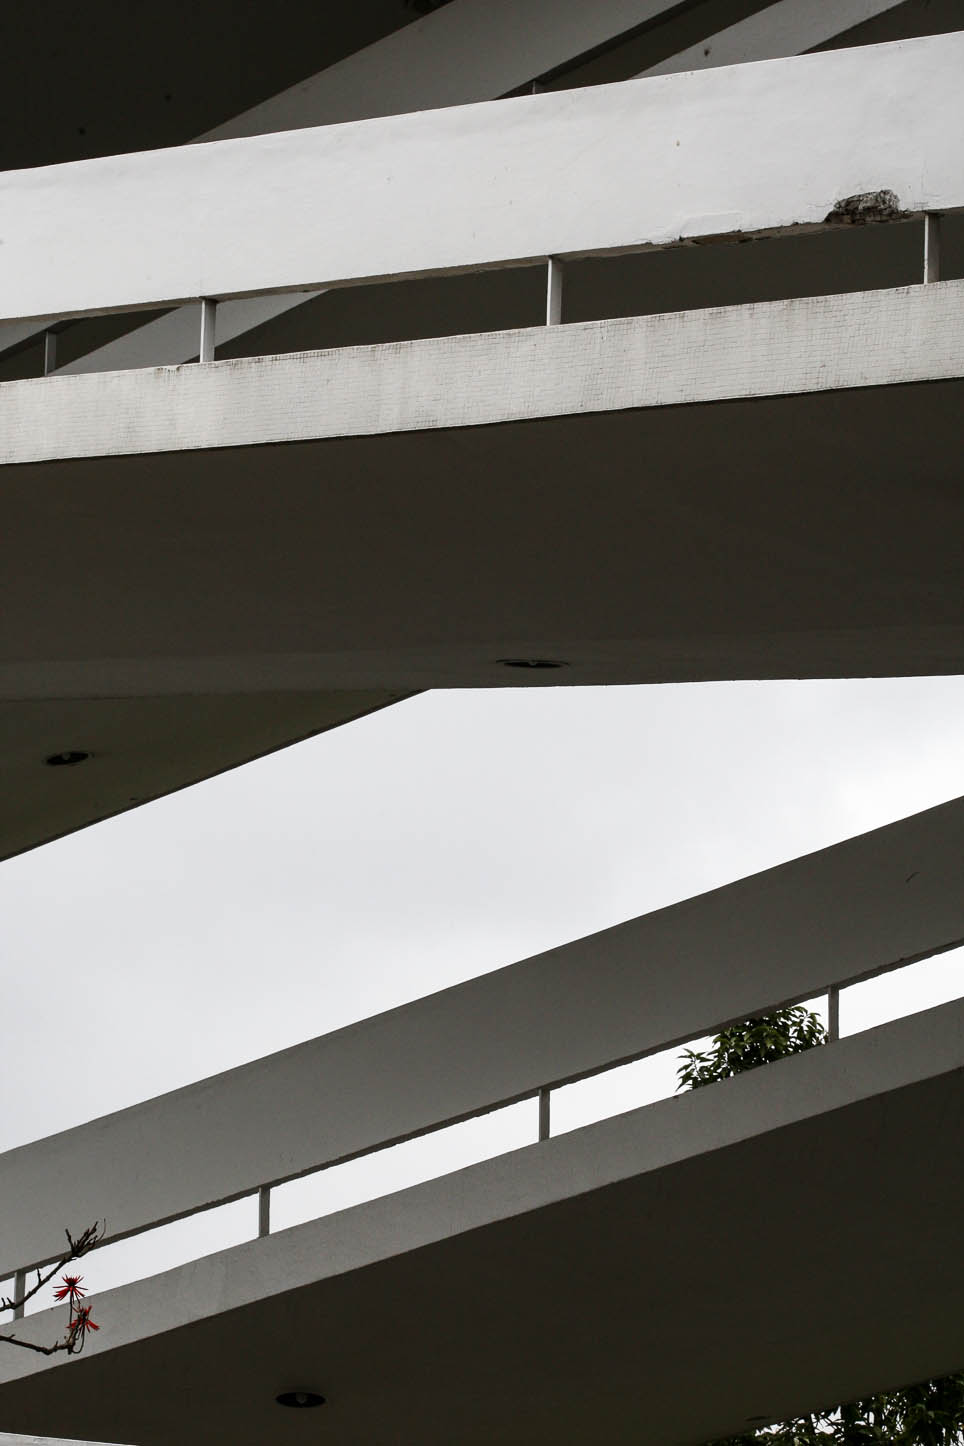 Prédio da Bienal, Parque do Ibirapuera